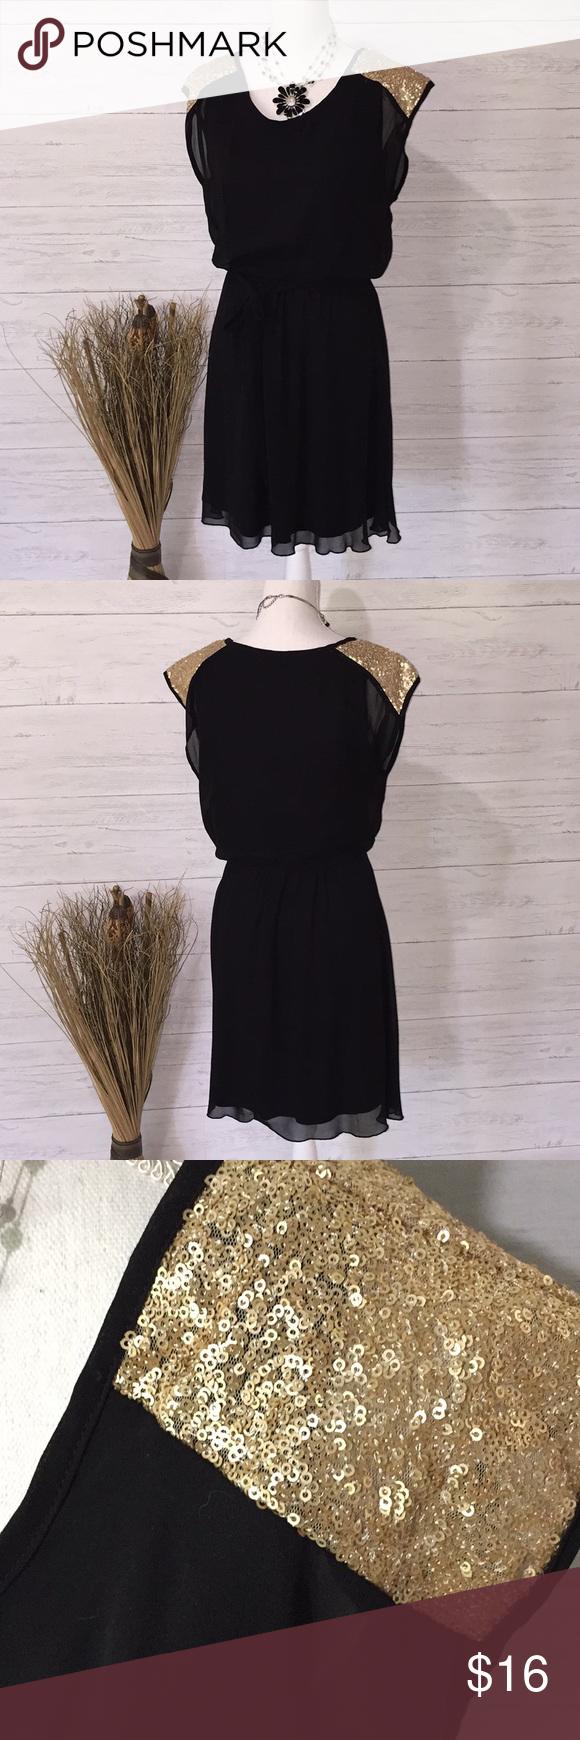 Tacera Black Chiffon Dress M Tacera Black Chiffon Dress Gold Sequence Accents On Shoulders Tie With Elastic Waist Chiffon Dress Black Chiffon Dress Dresses [ 1740 x 580 Pixel ]